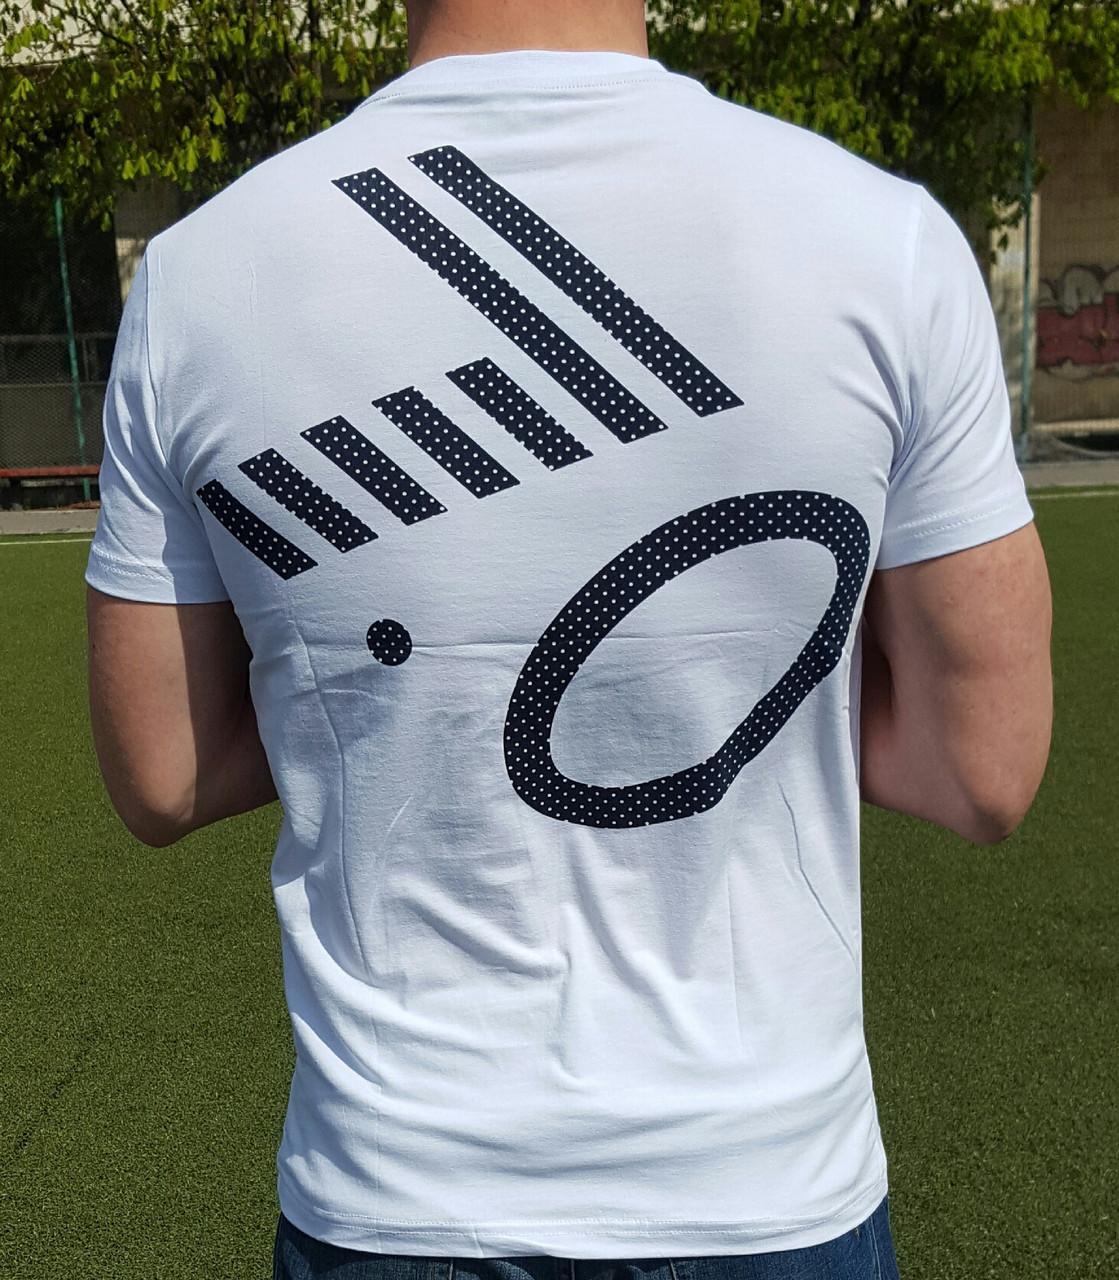 c67f20b7f54ac Мужская футболка Armani 7.0 белая реплика, цена 350 грн., купить в ...